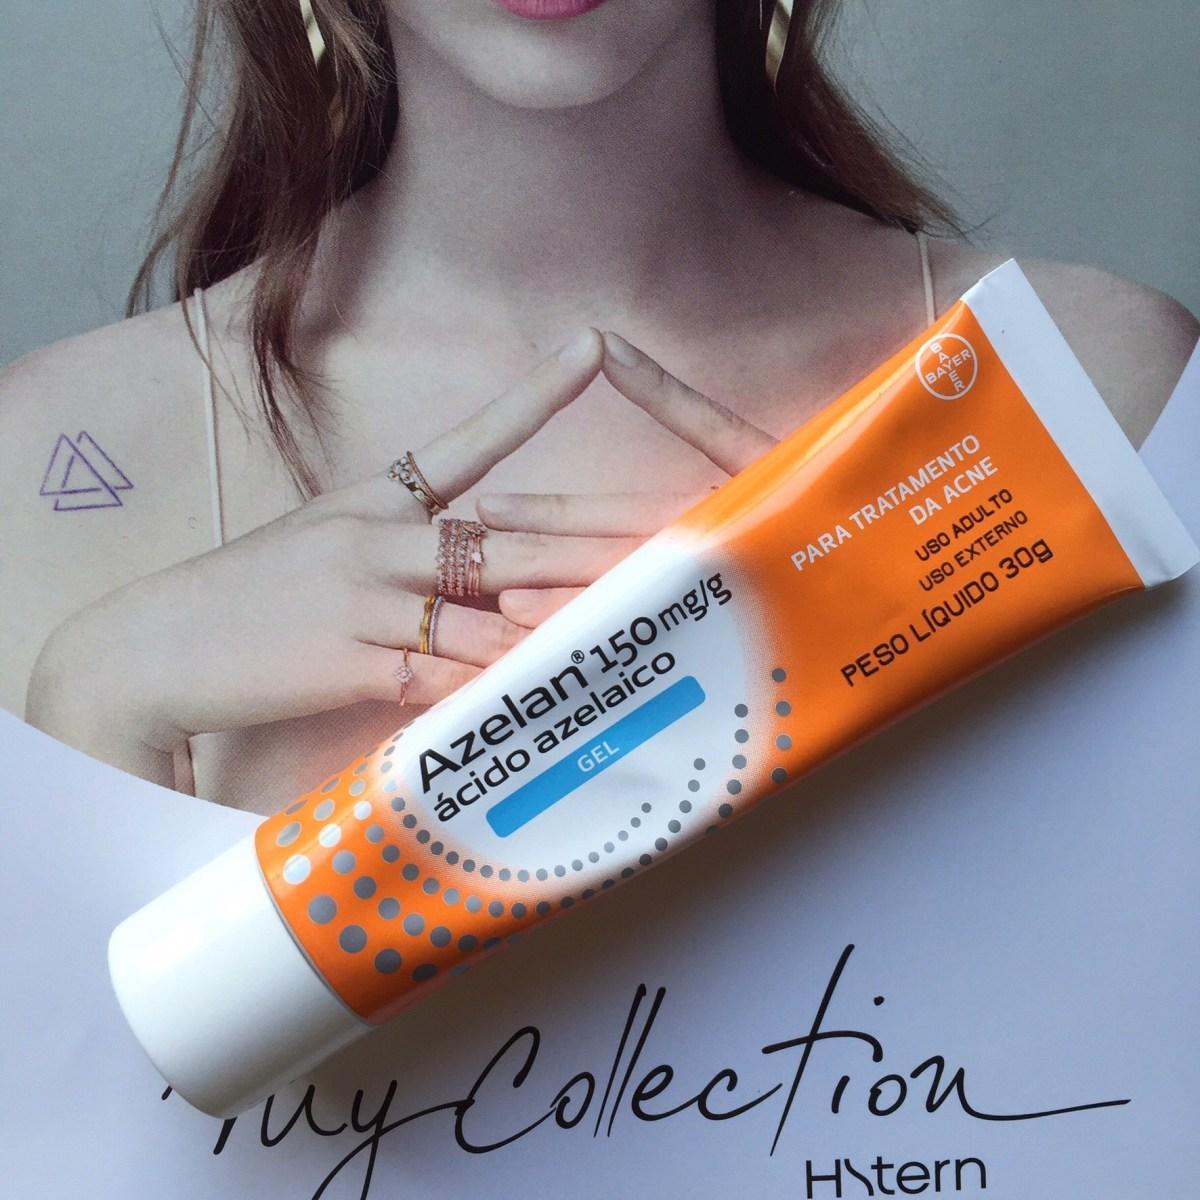 Azelan gel: Meu aliado contra a acne e rosácea